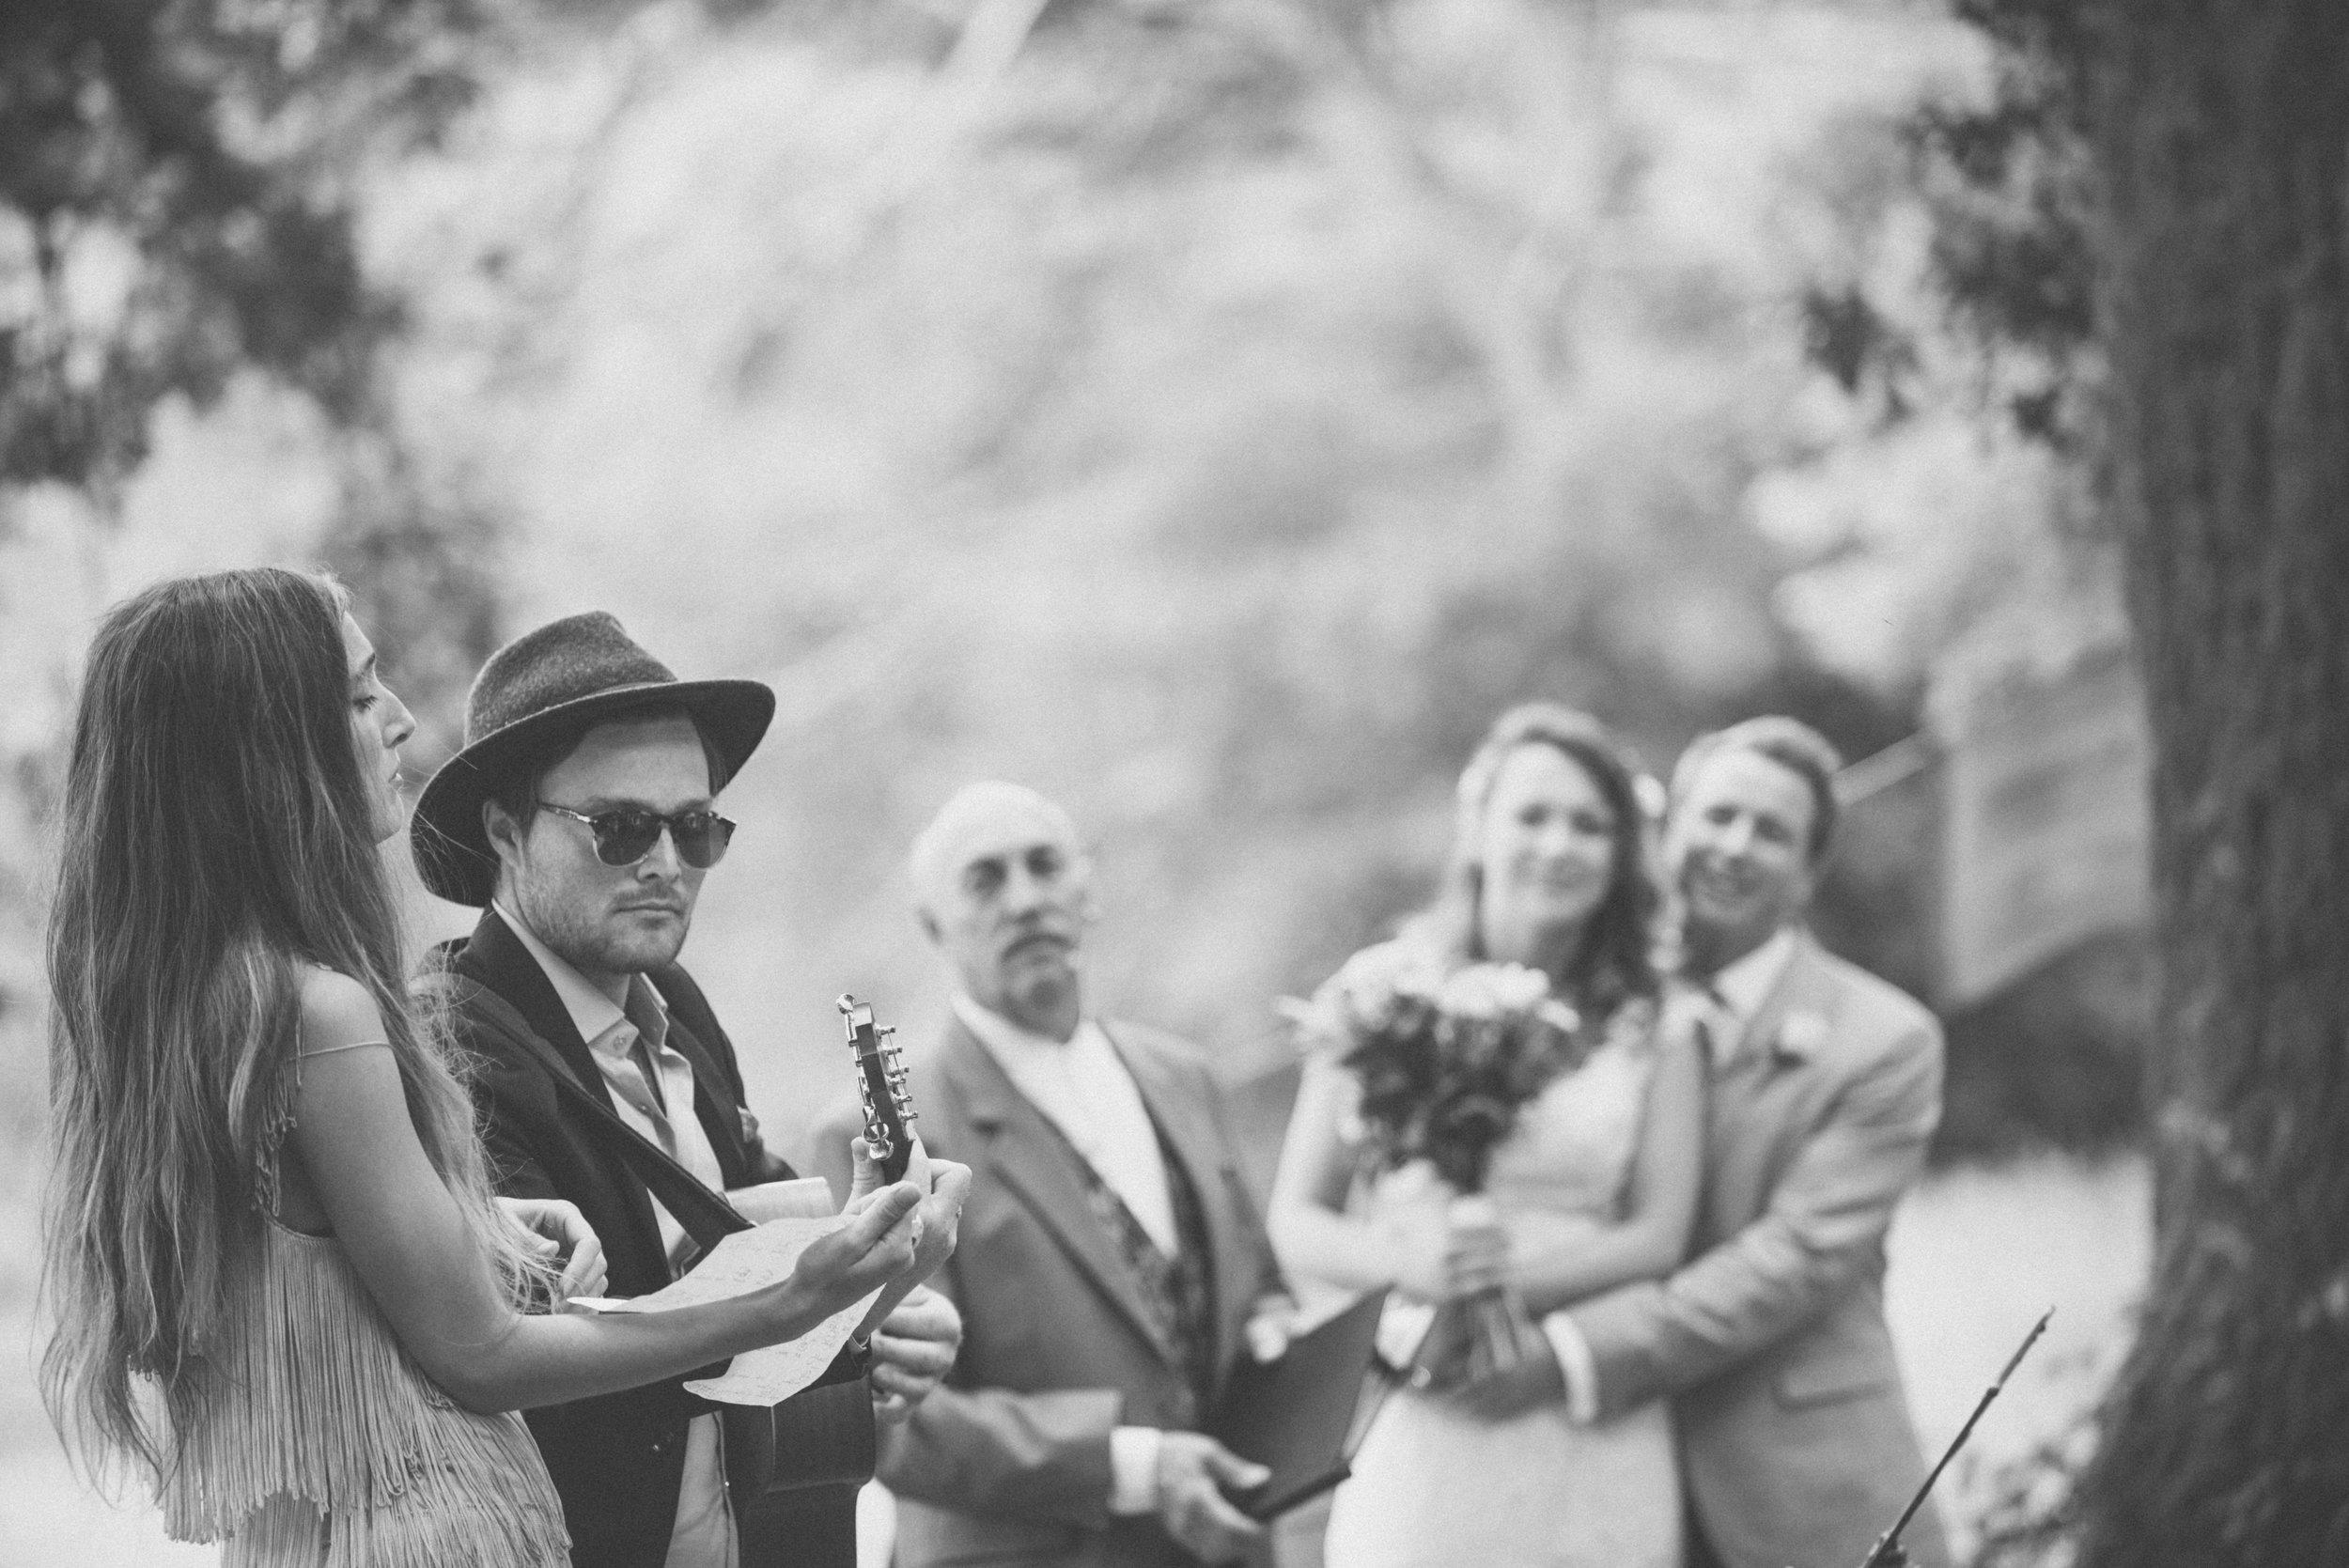 dordogne-wedding-photographer-mark-shaw-27.jpg